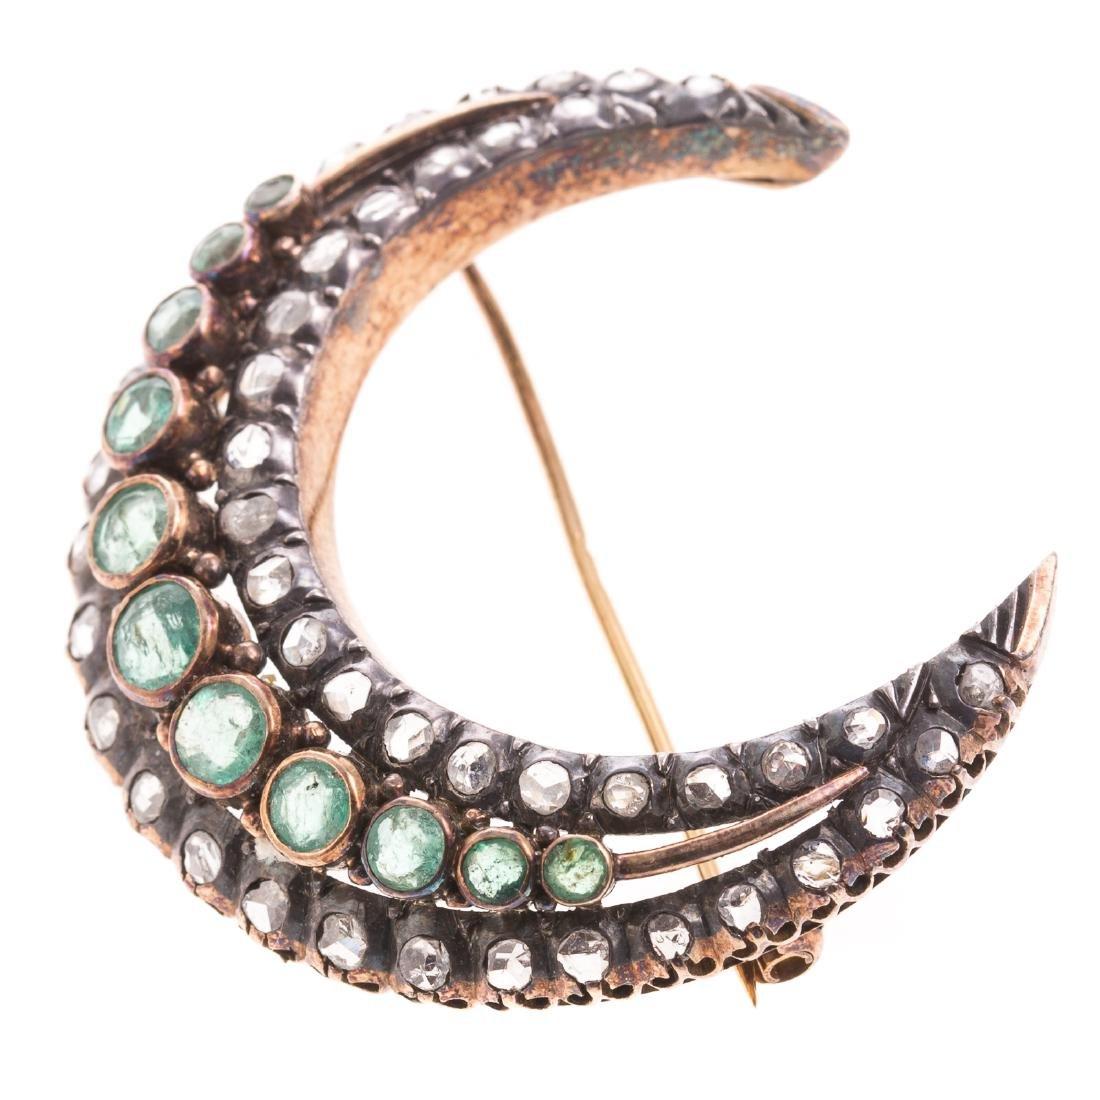 An Edwardian Emerald & Diamond Crescent Moon Pin - 2